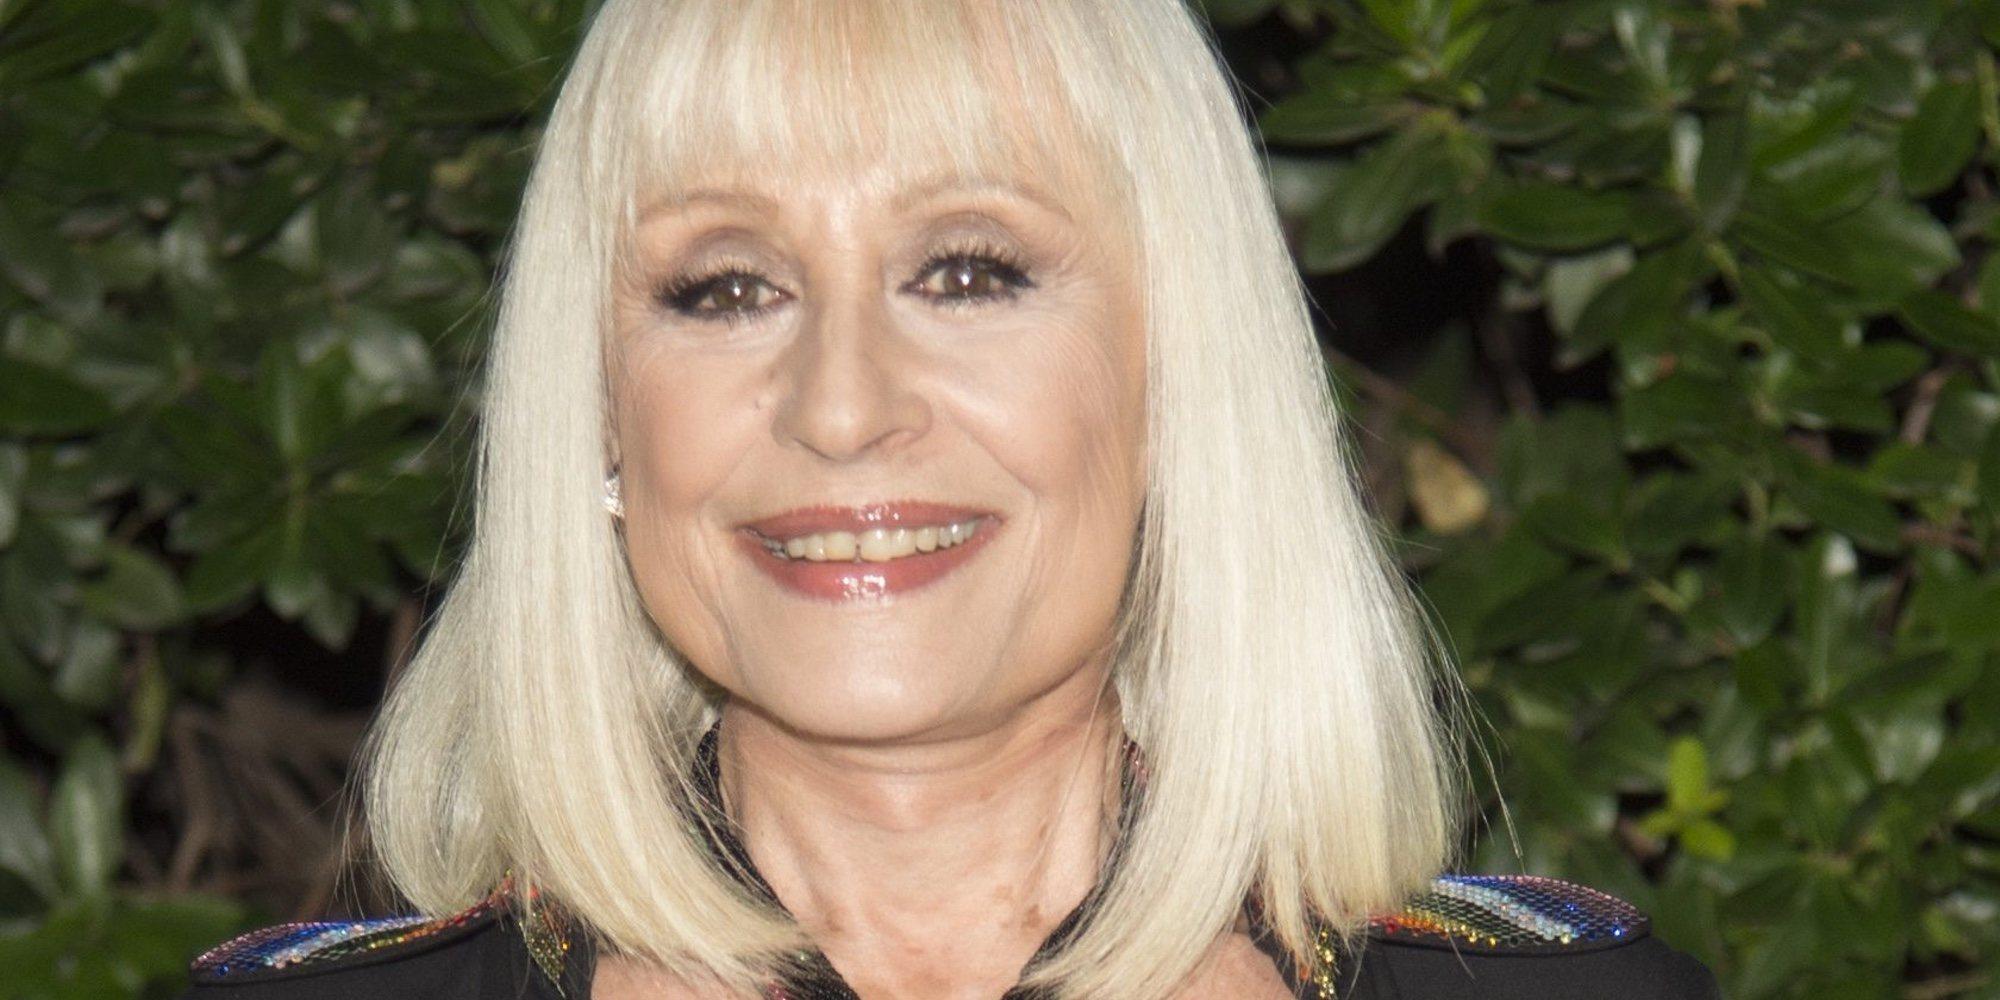 Raffaella Carrà emociona a Loles León y a Rappel en 'Volverte a ver'